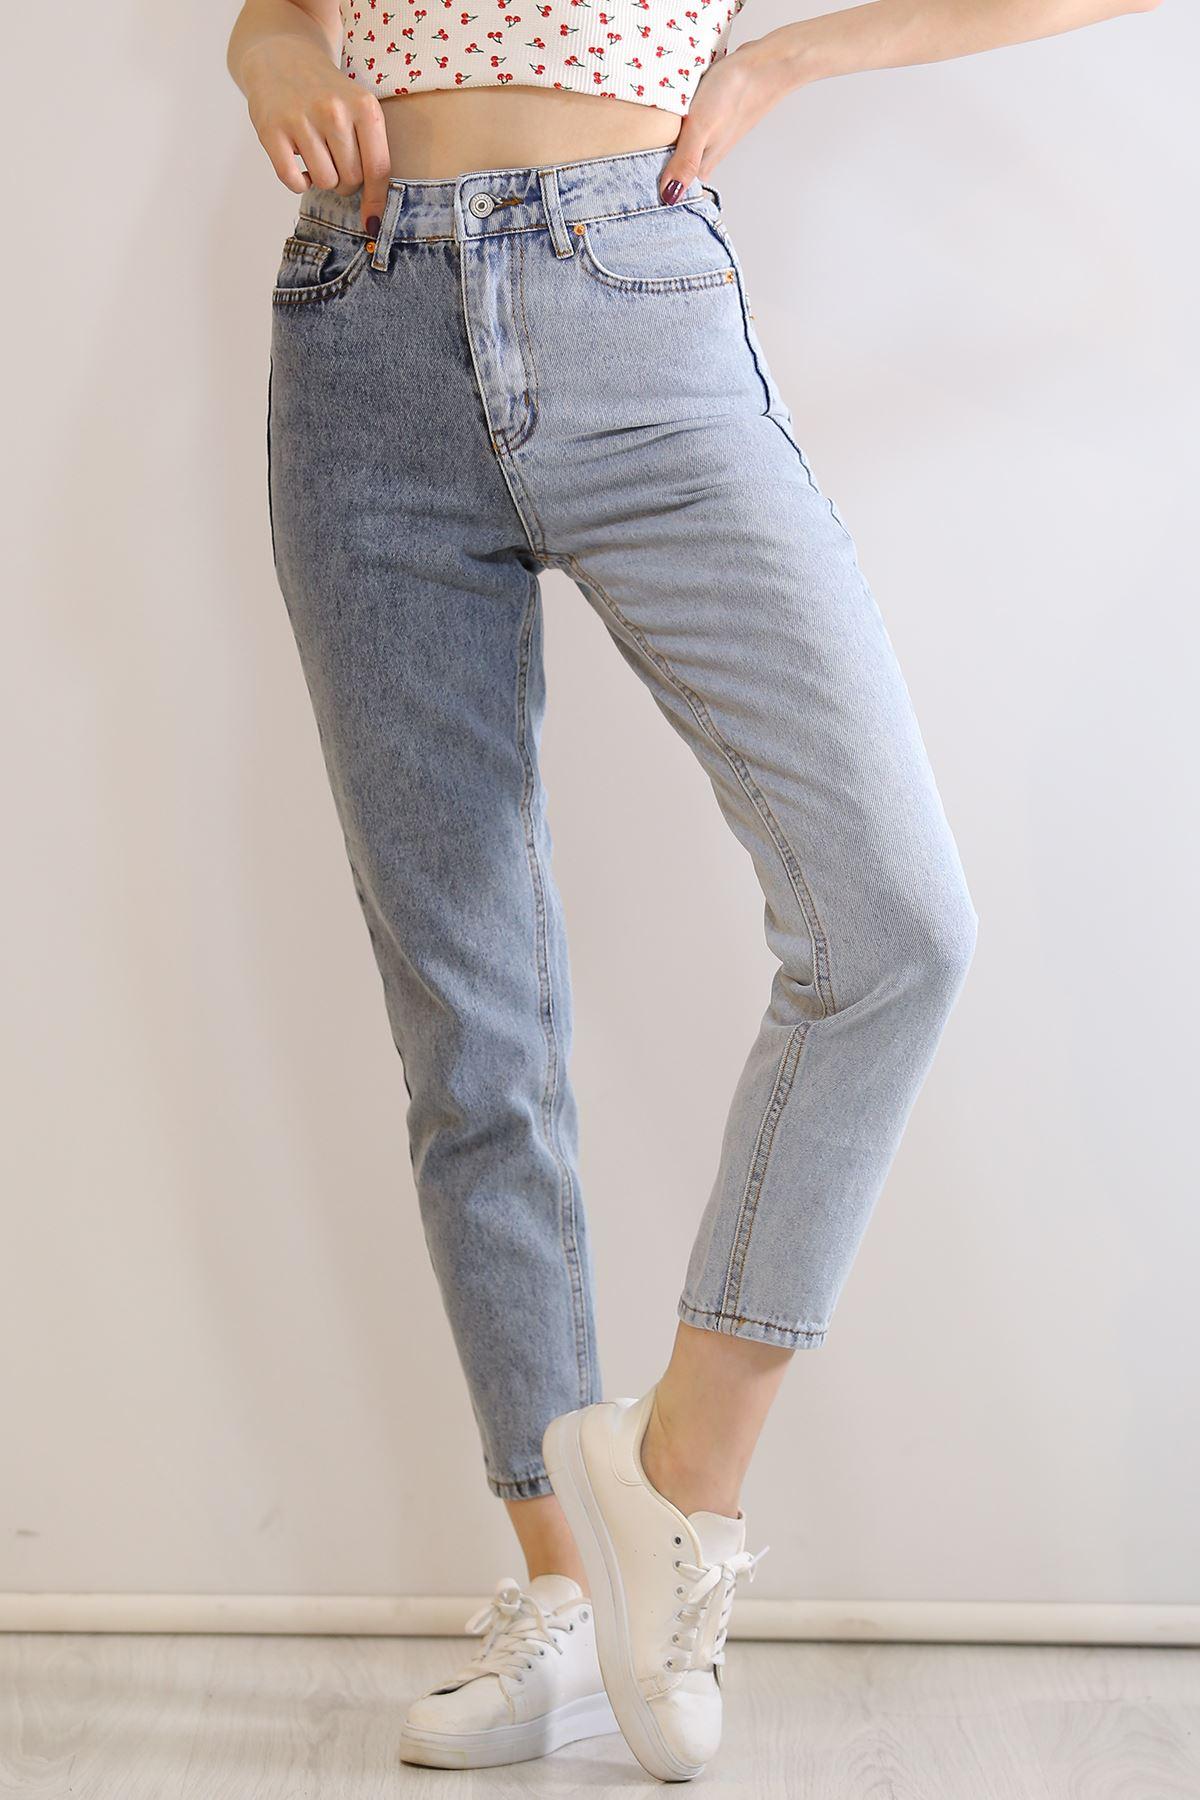 İki Renk Paça Kesik Kot Pantolon Kot - 6029.392.